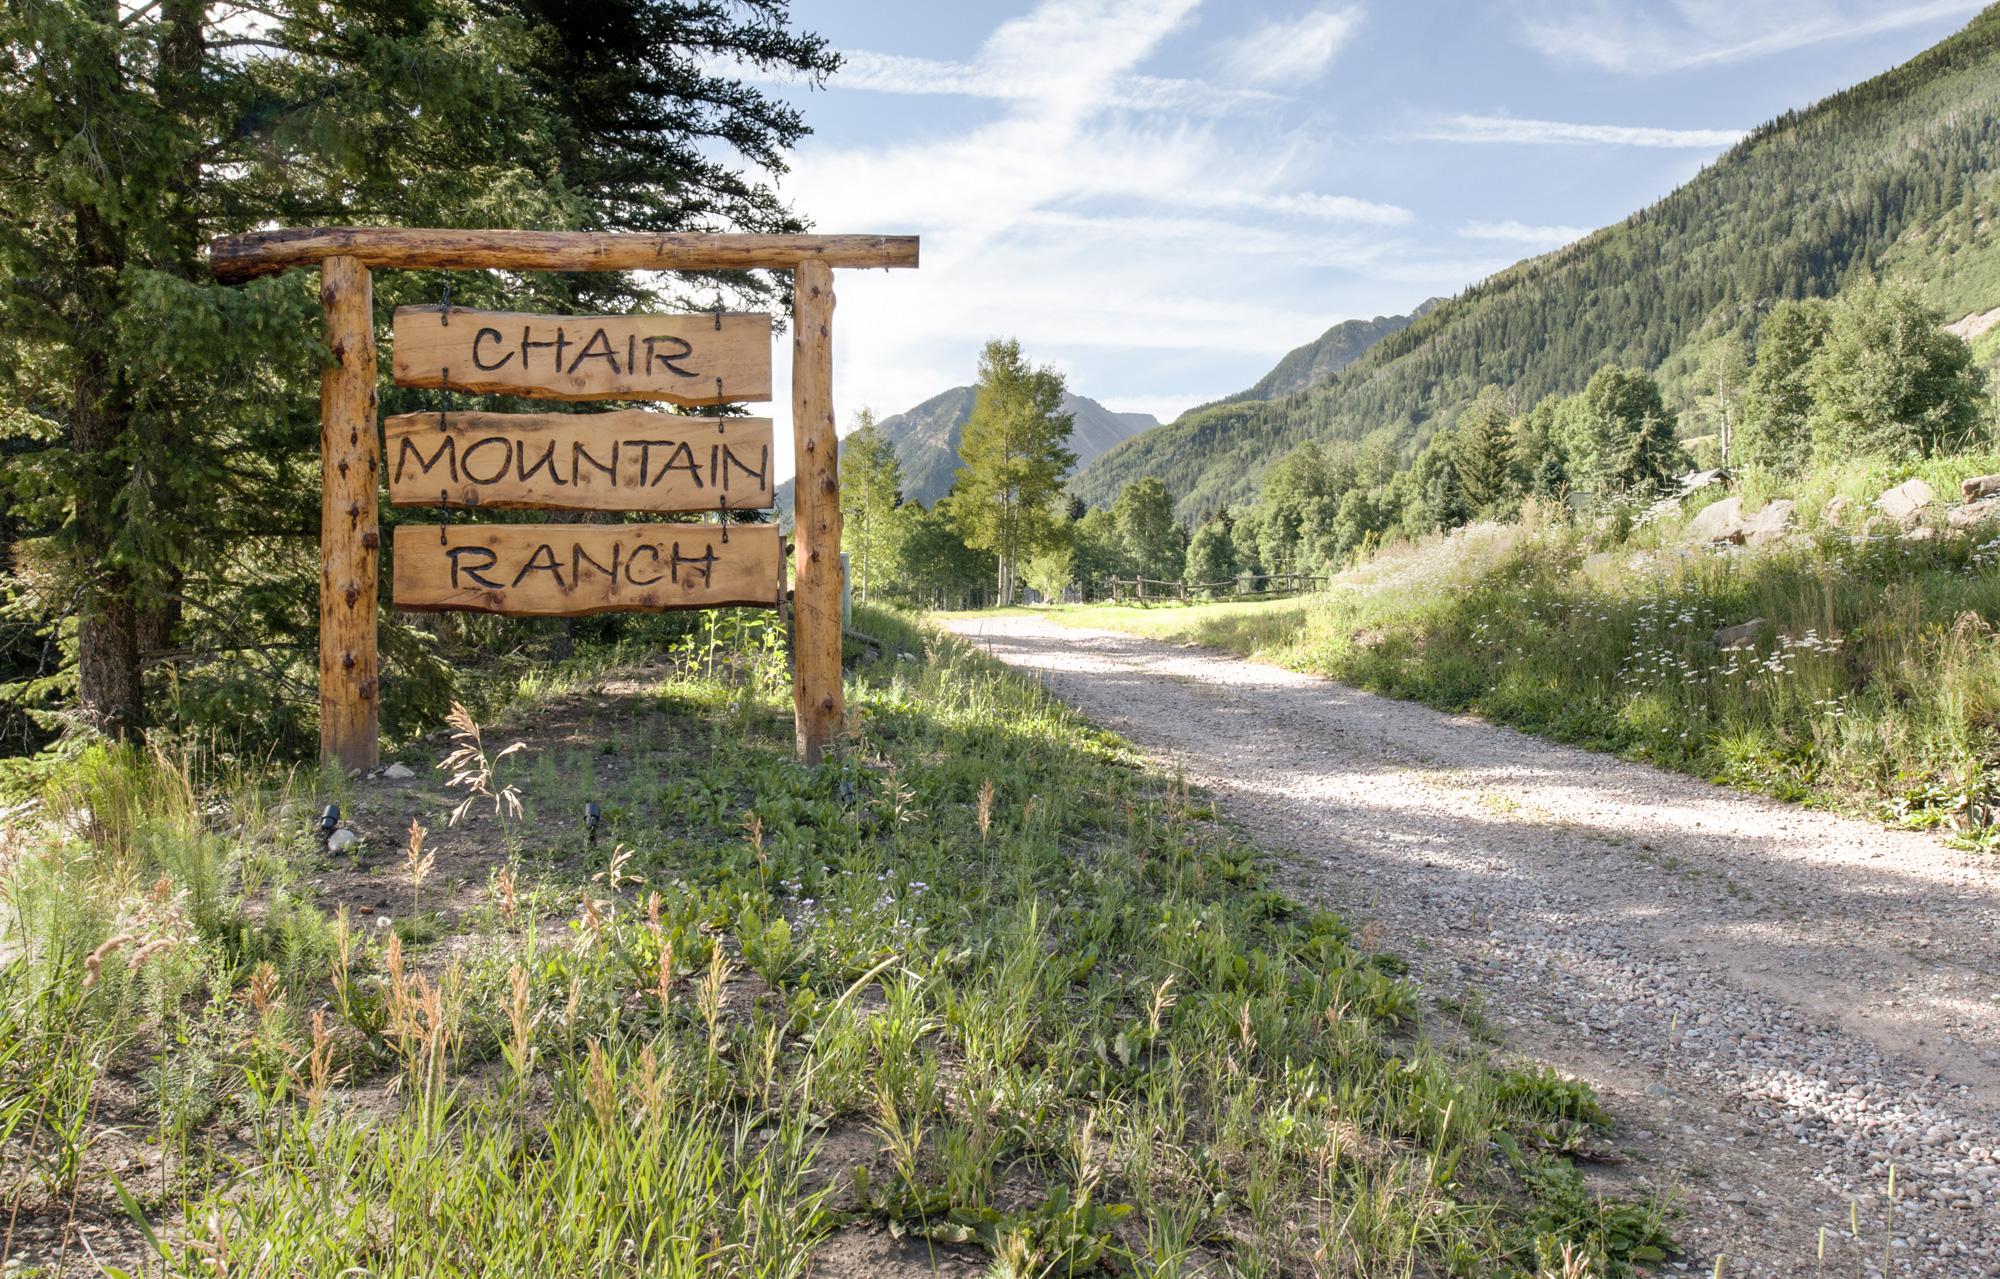 Chair_Mountain_RanchChair-Mountain-Ranch-sign.jpg